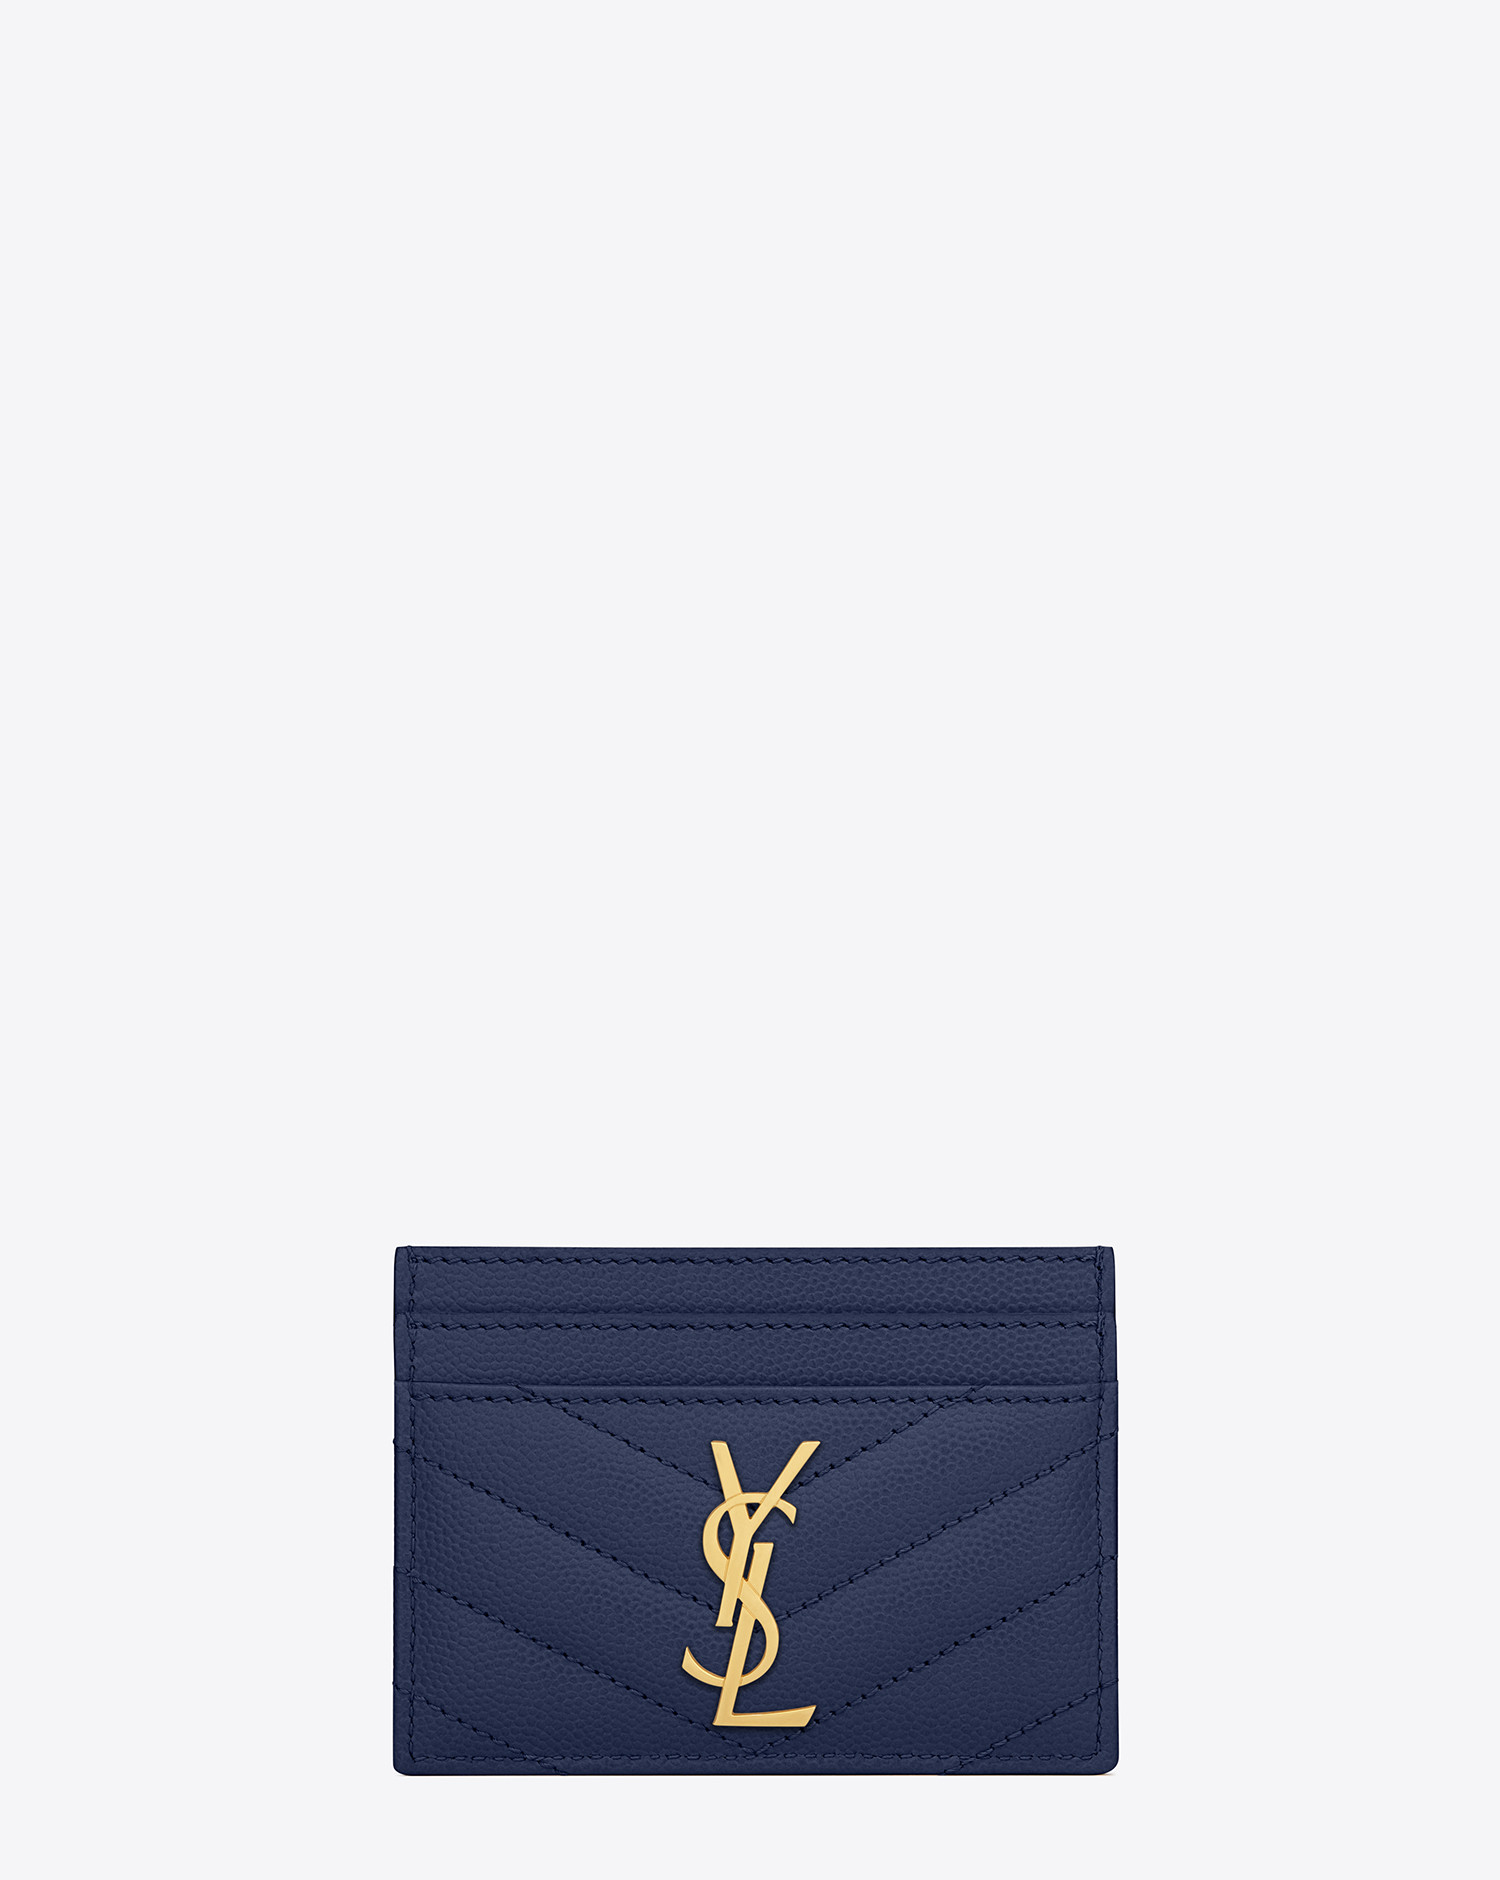 визитница Yves Saint Laurent 45249591mj YSL визитница yves saint laurent 45249591mj ysl